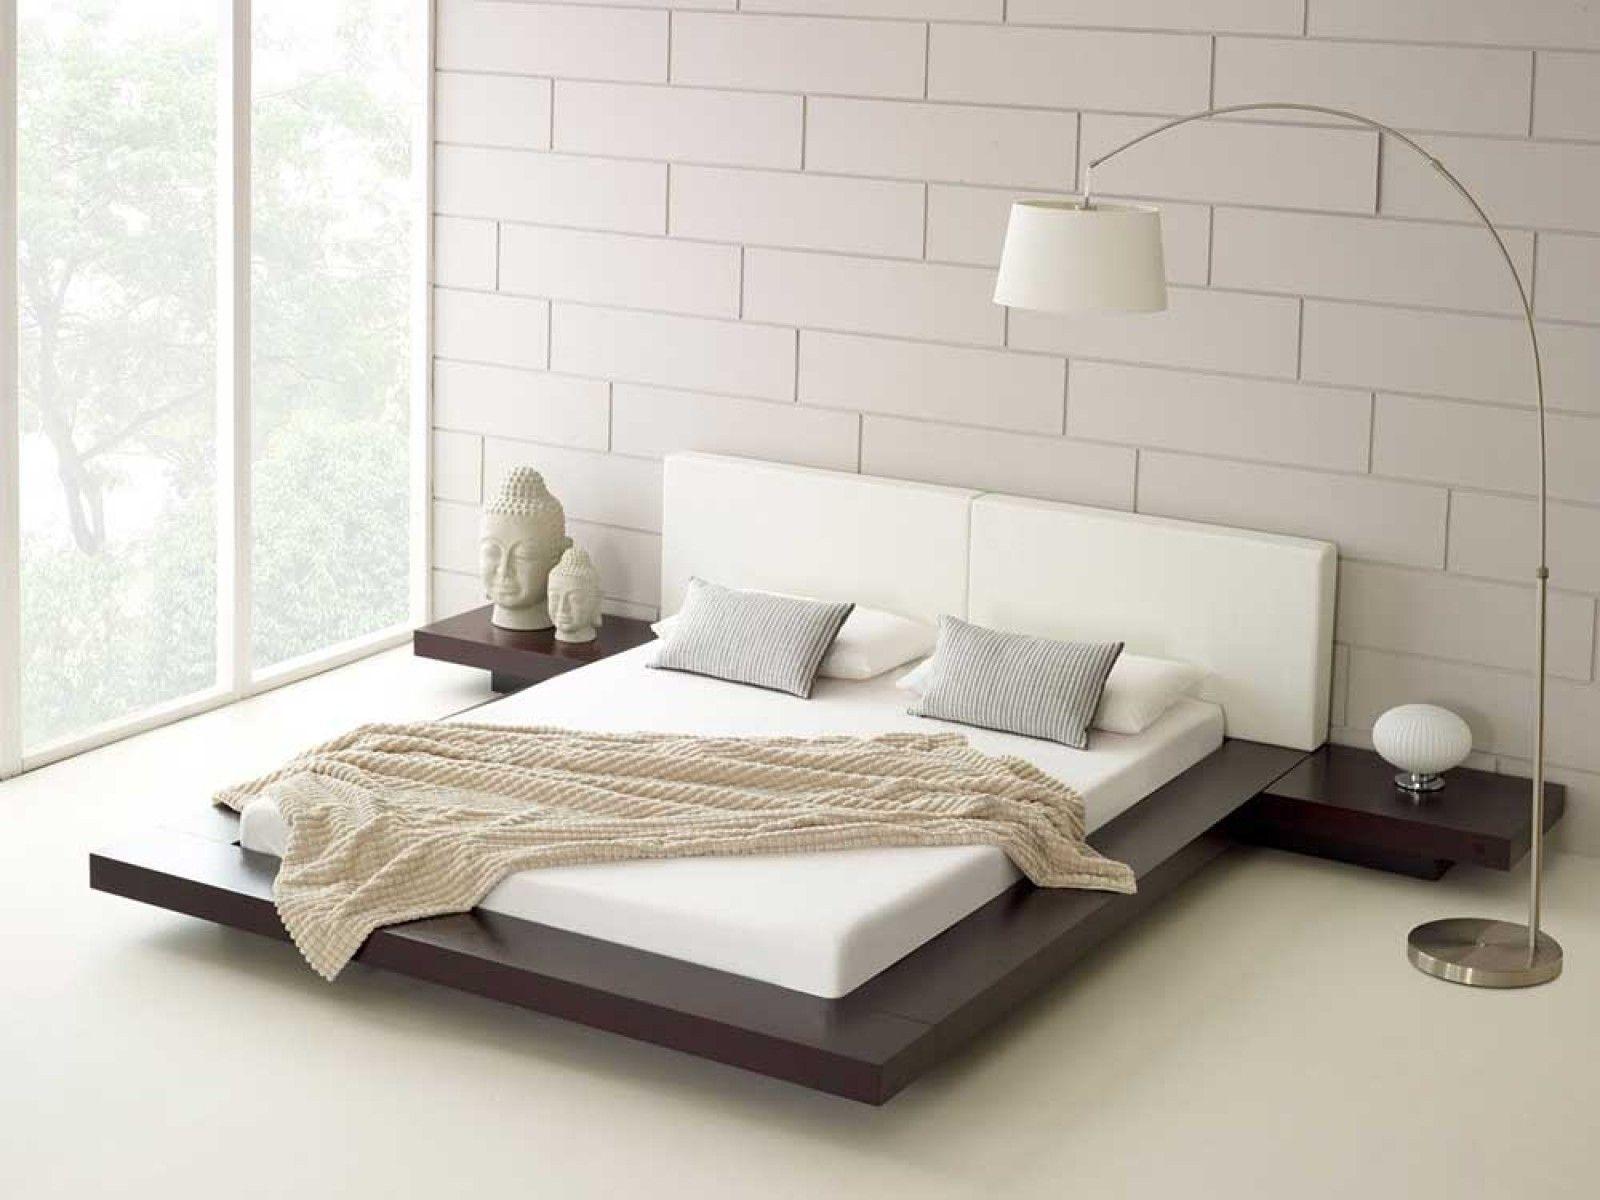 Camas Modernas | Pinterest | Schlafzimmer